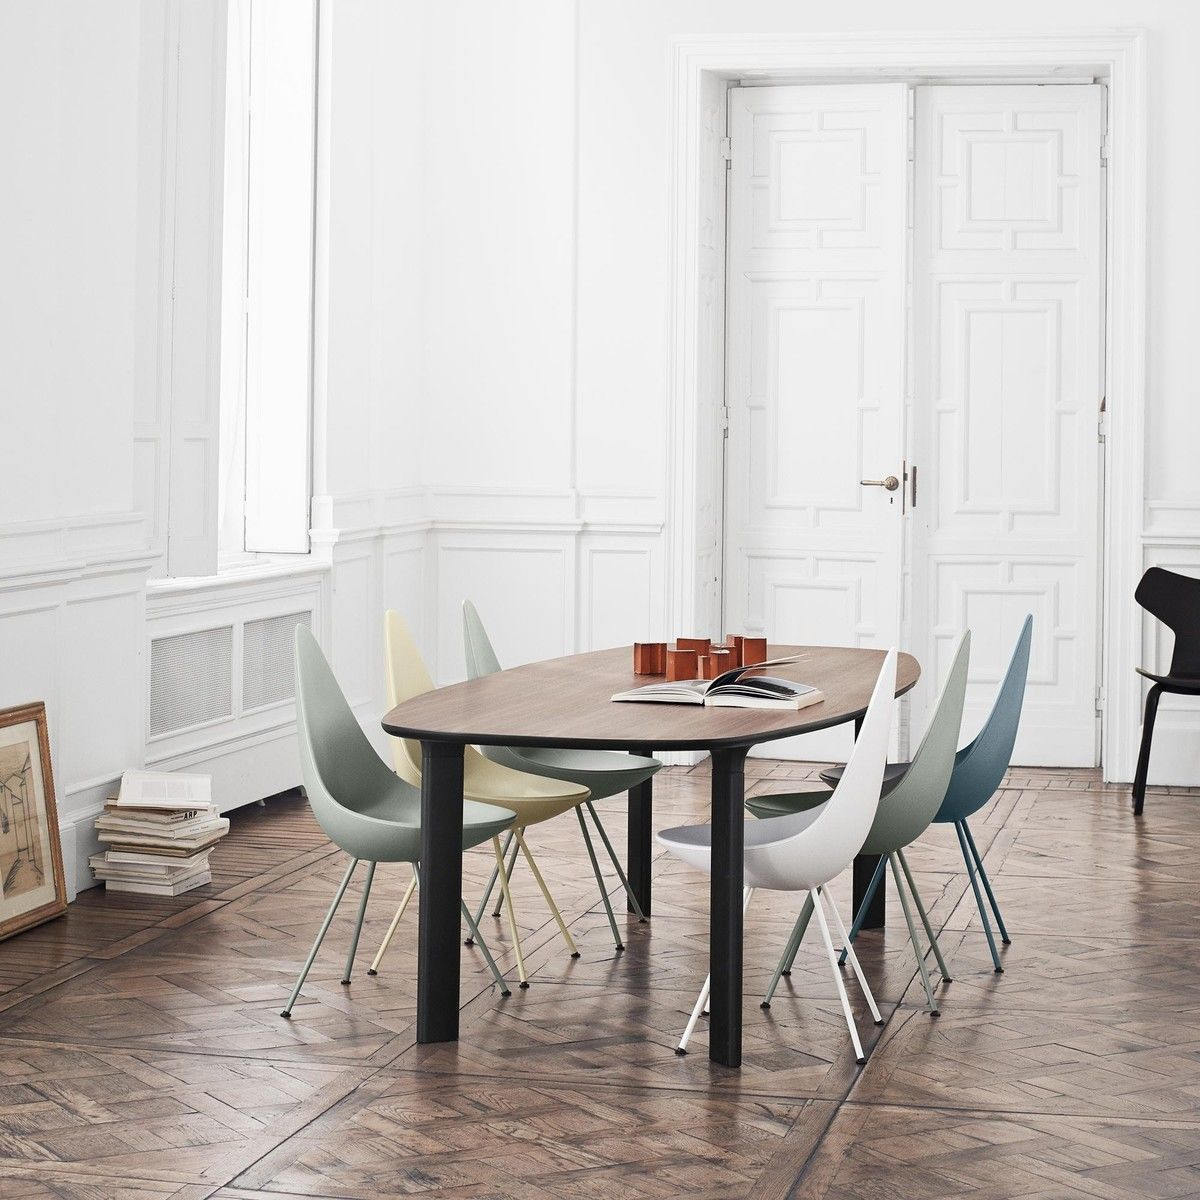 drop stuhl fritz hansen. Black Bedroom Furniture Sets. Home Design Ideas